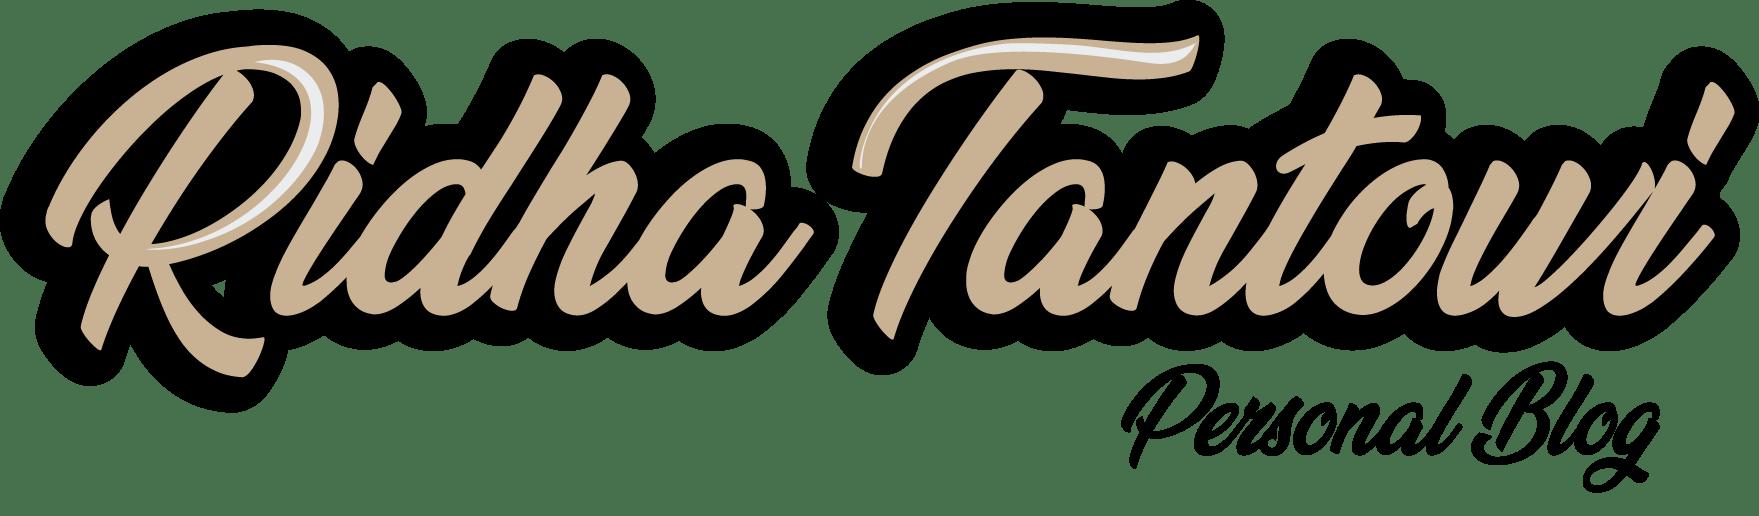 Ridha Tantowi's Personal Blog